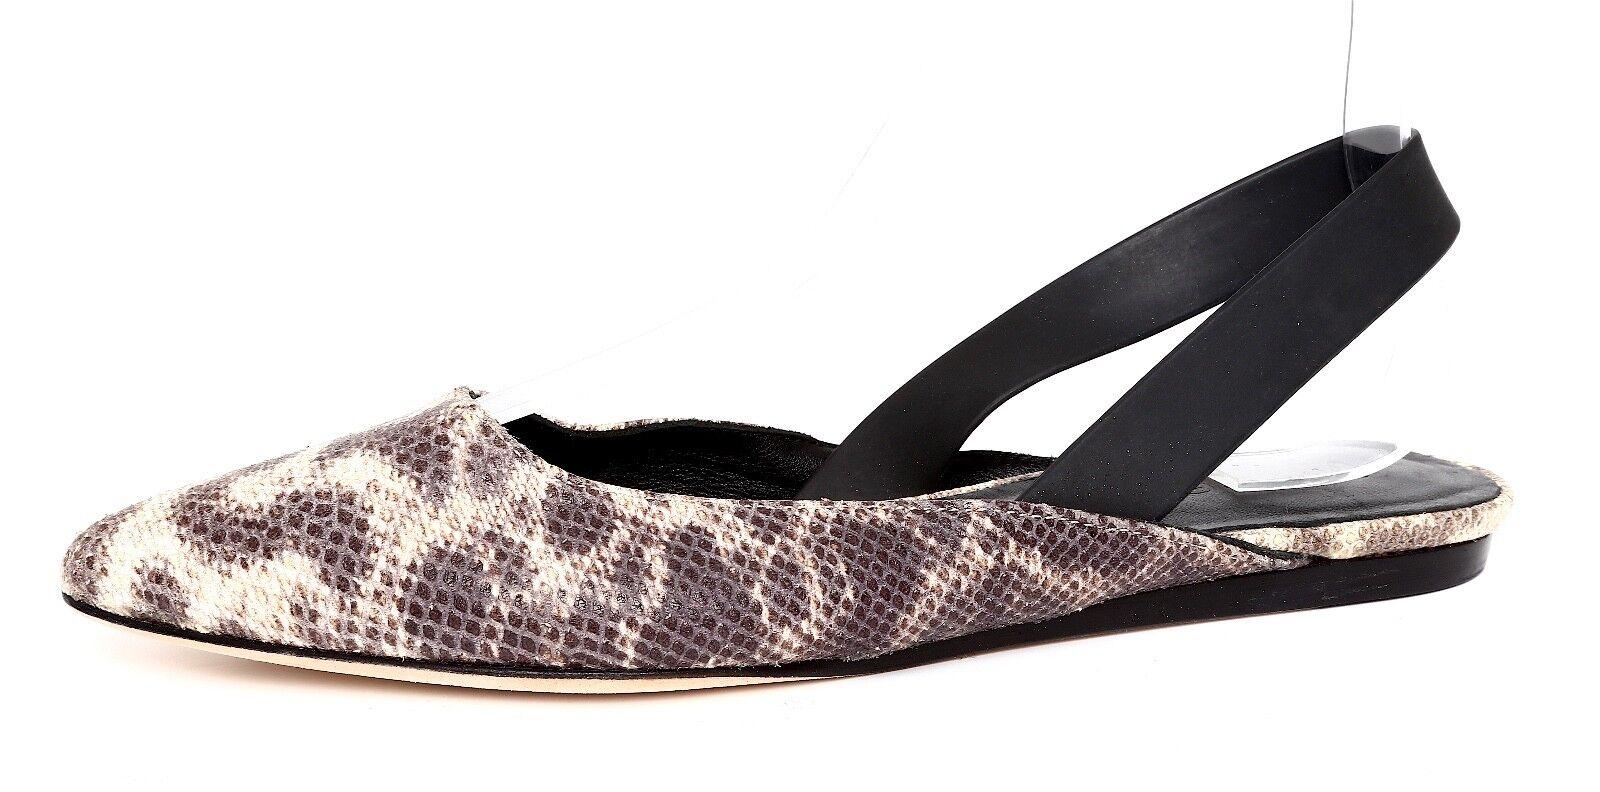 Vince Naomi Snakeprint Leather Women's Natural Flat Sz 7.5M 4345